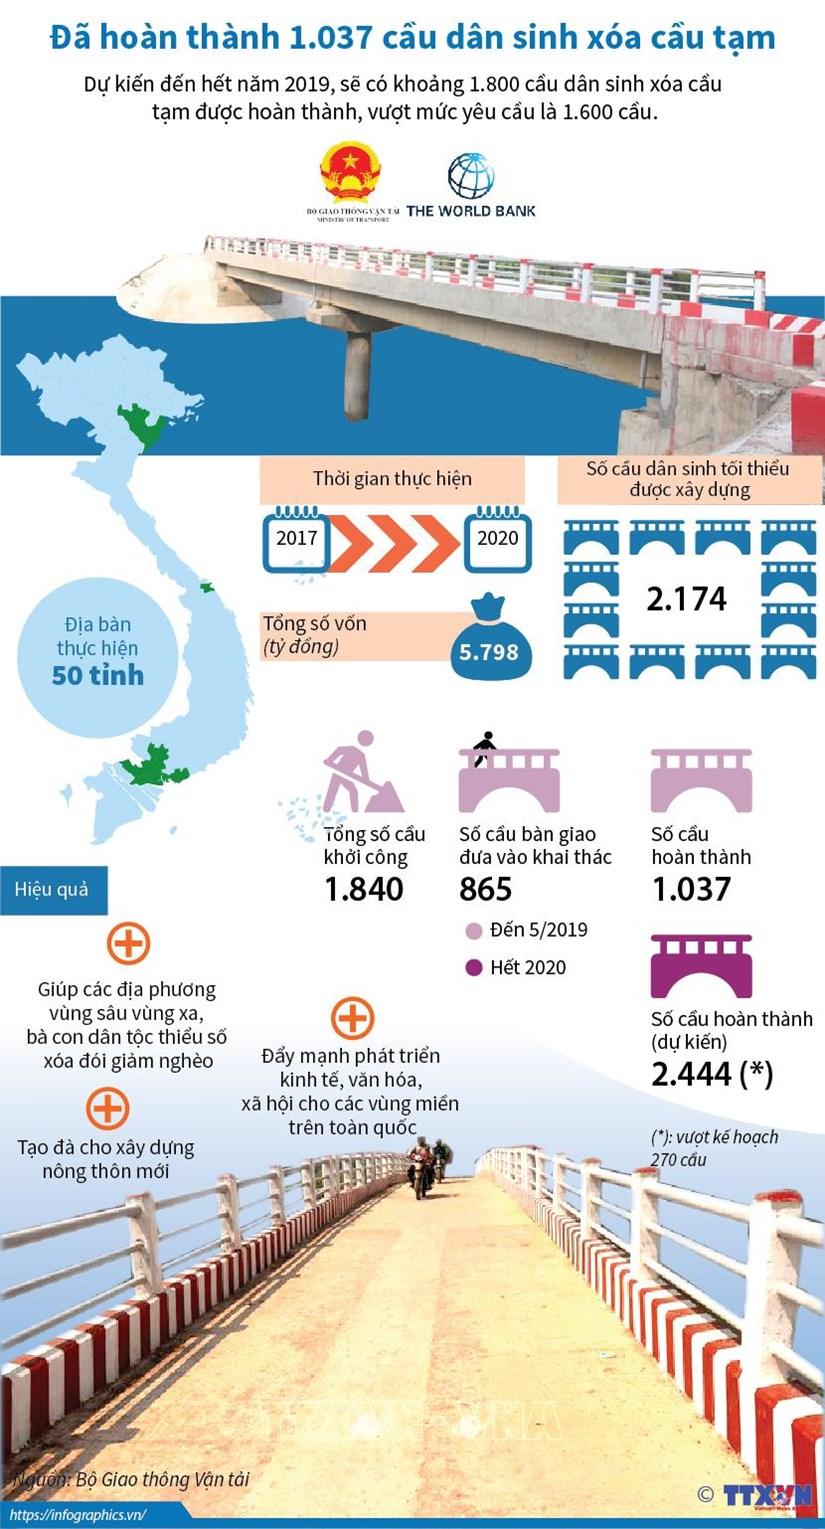 [Infographics] Da hoan thanh 1.037 cau dan sinh xoa cau tam hinh anh 1